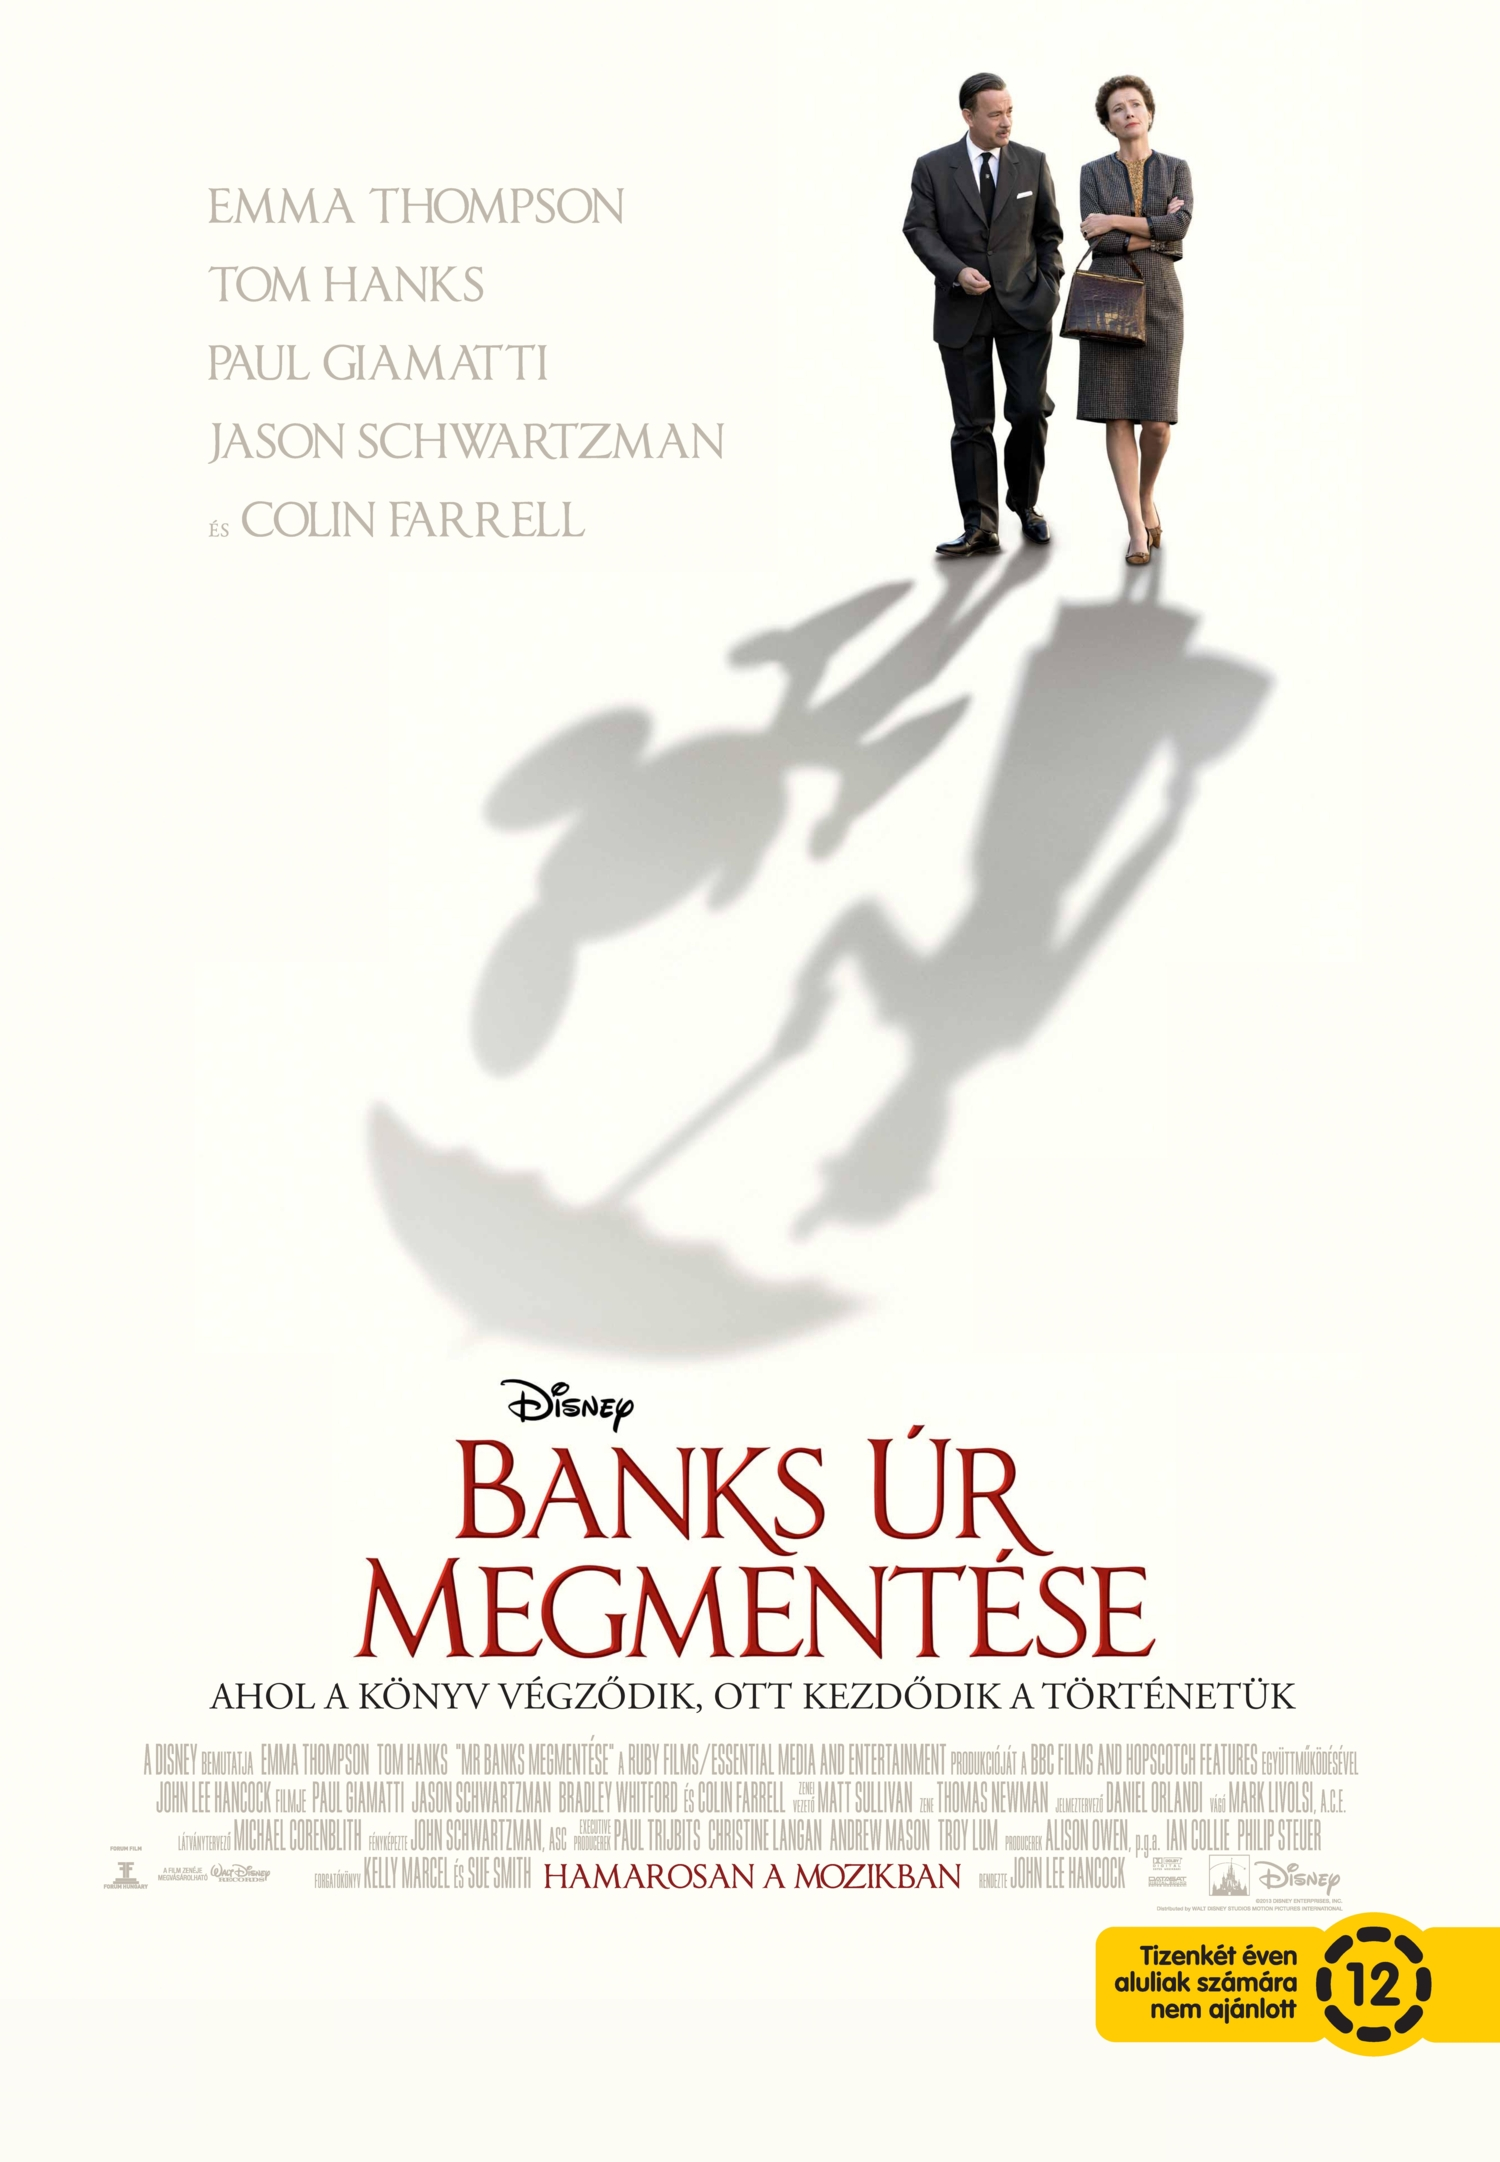 Mr_Banks_hun.jpg